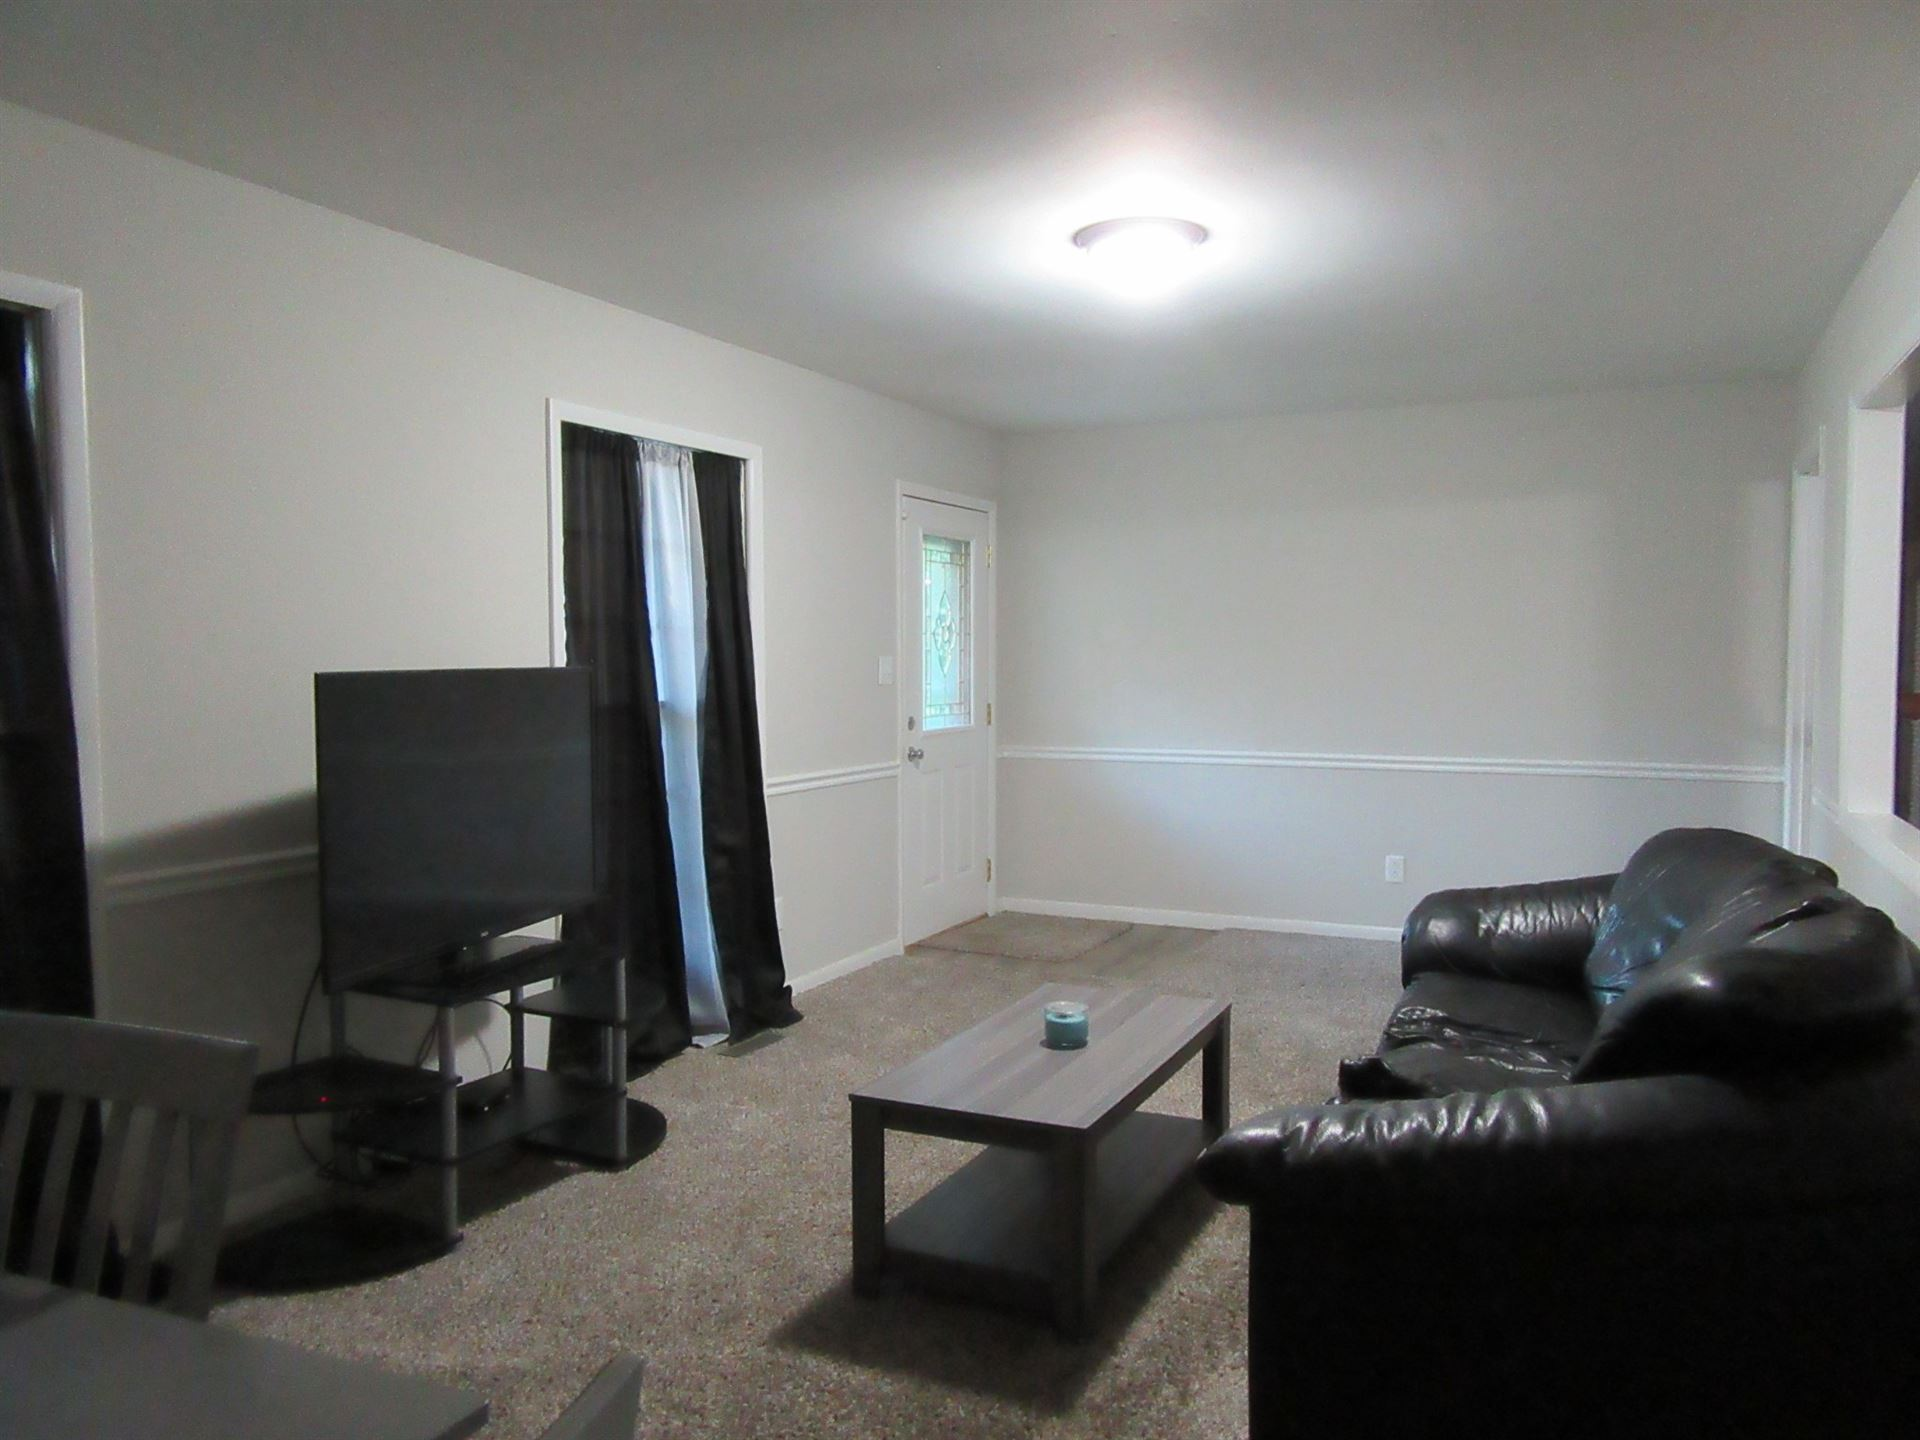 Photo of 837 Britton Ave, Gallatin, TN 37066 (MLS # 2295224)